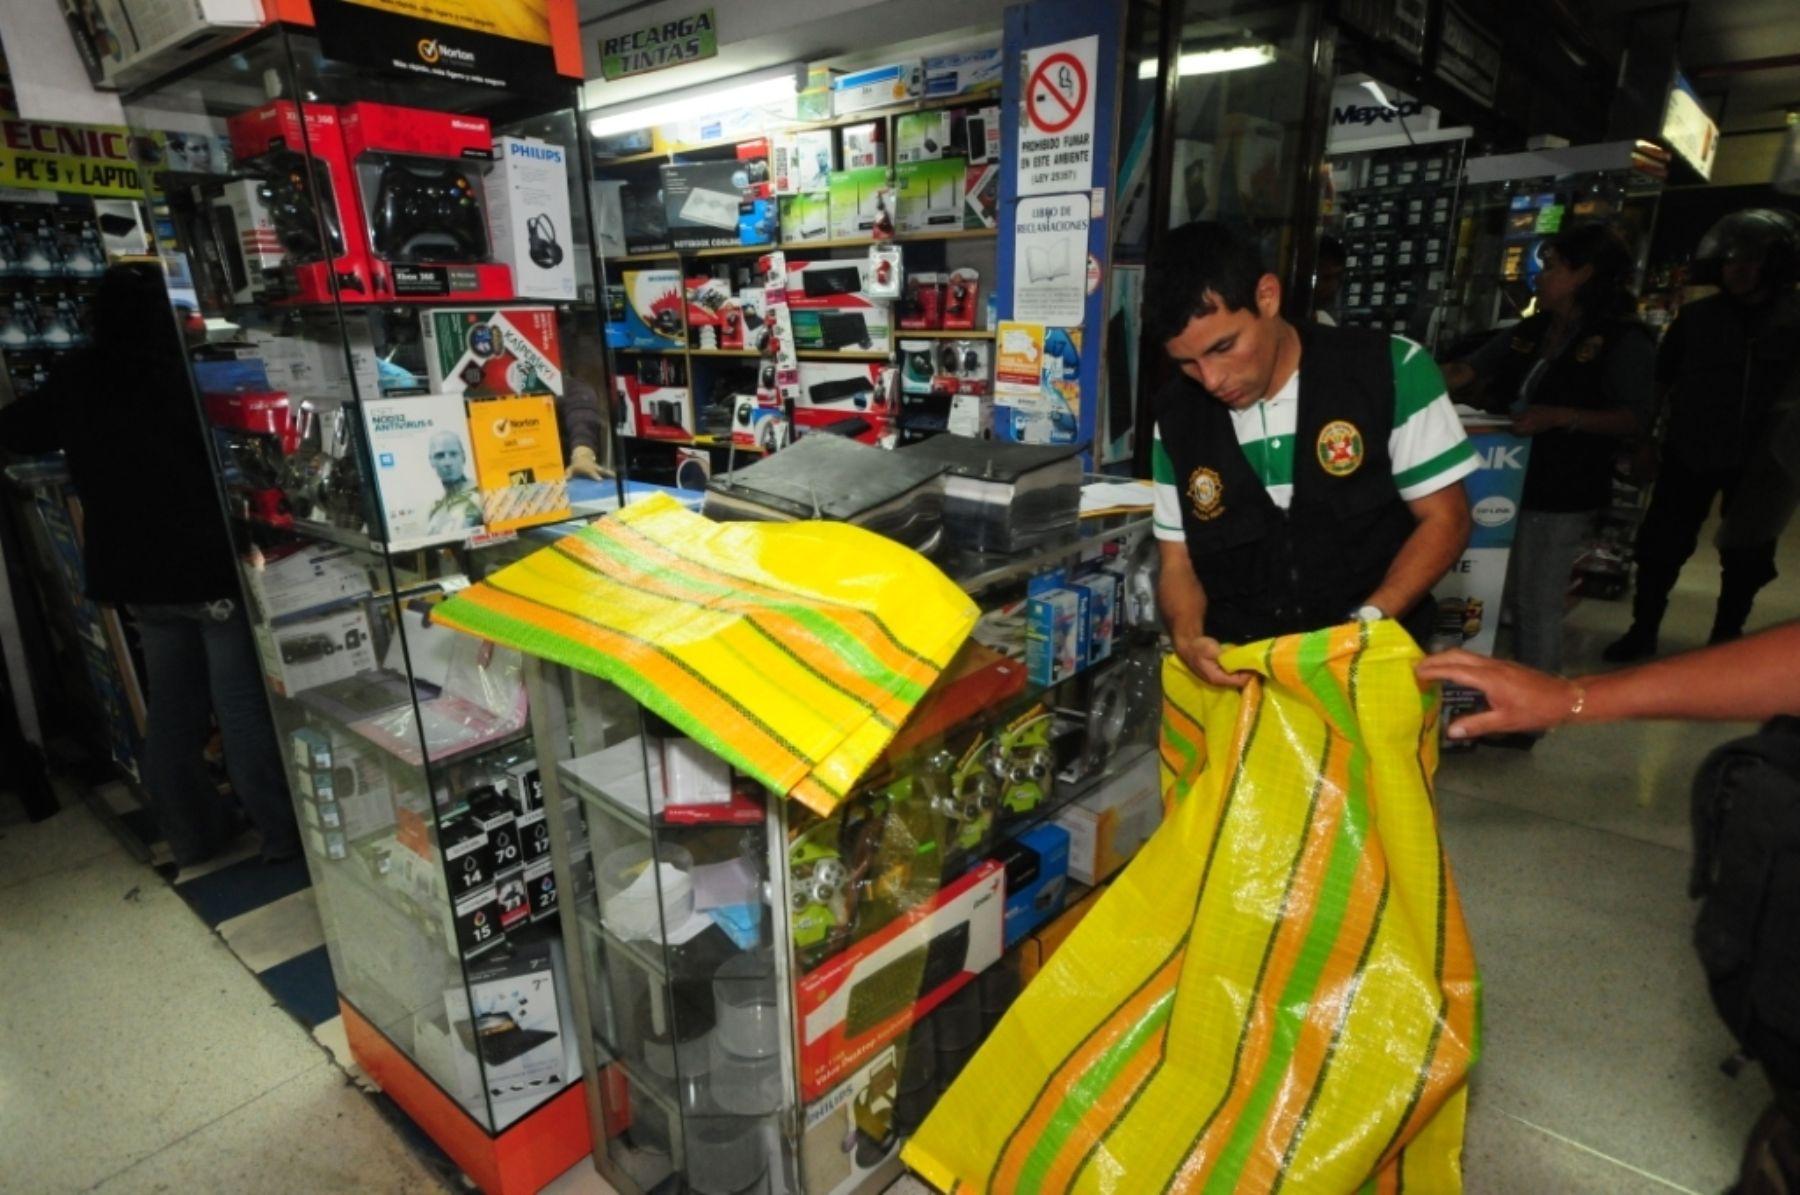 Decomiso de productos piratas.Foto:  ANDINA/Difusión.